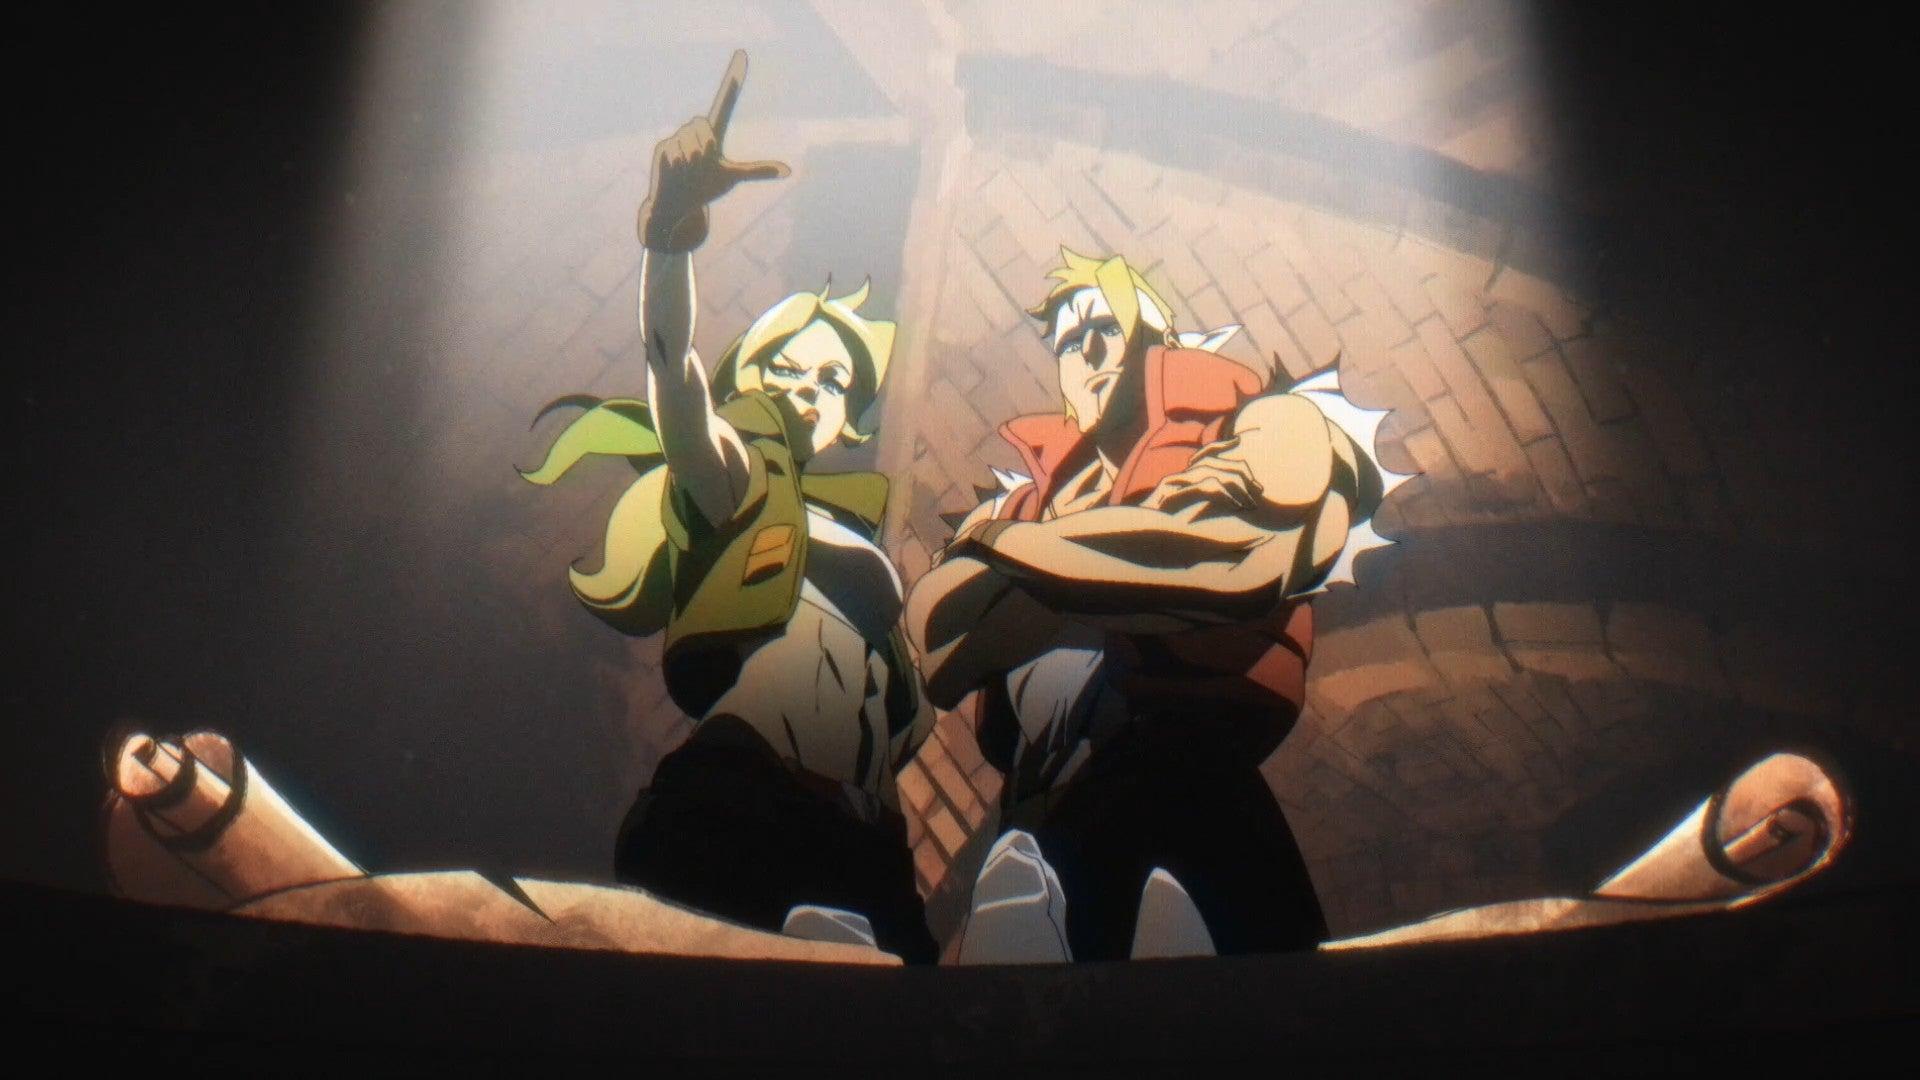 Image for Metal Slug Tactics announced, reunites Marco, Eri, Fio, and Tarma